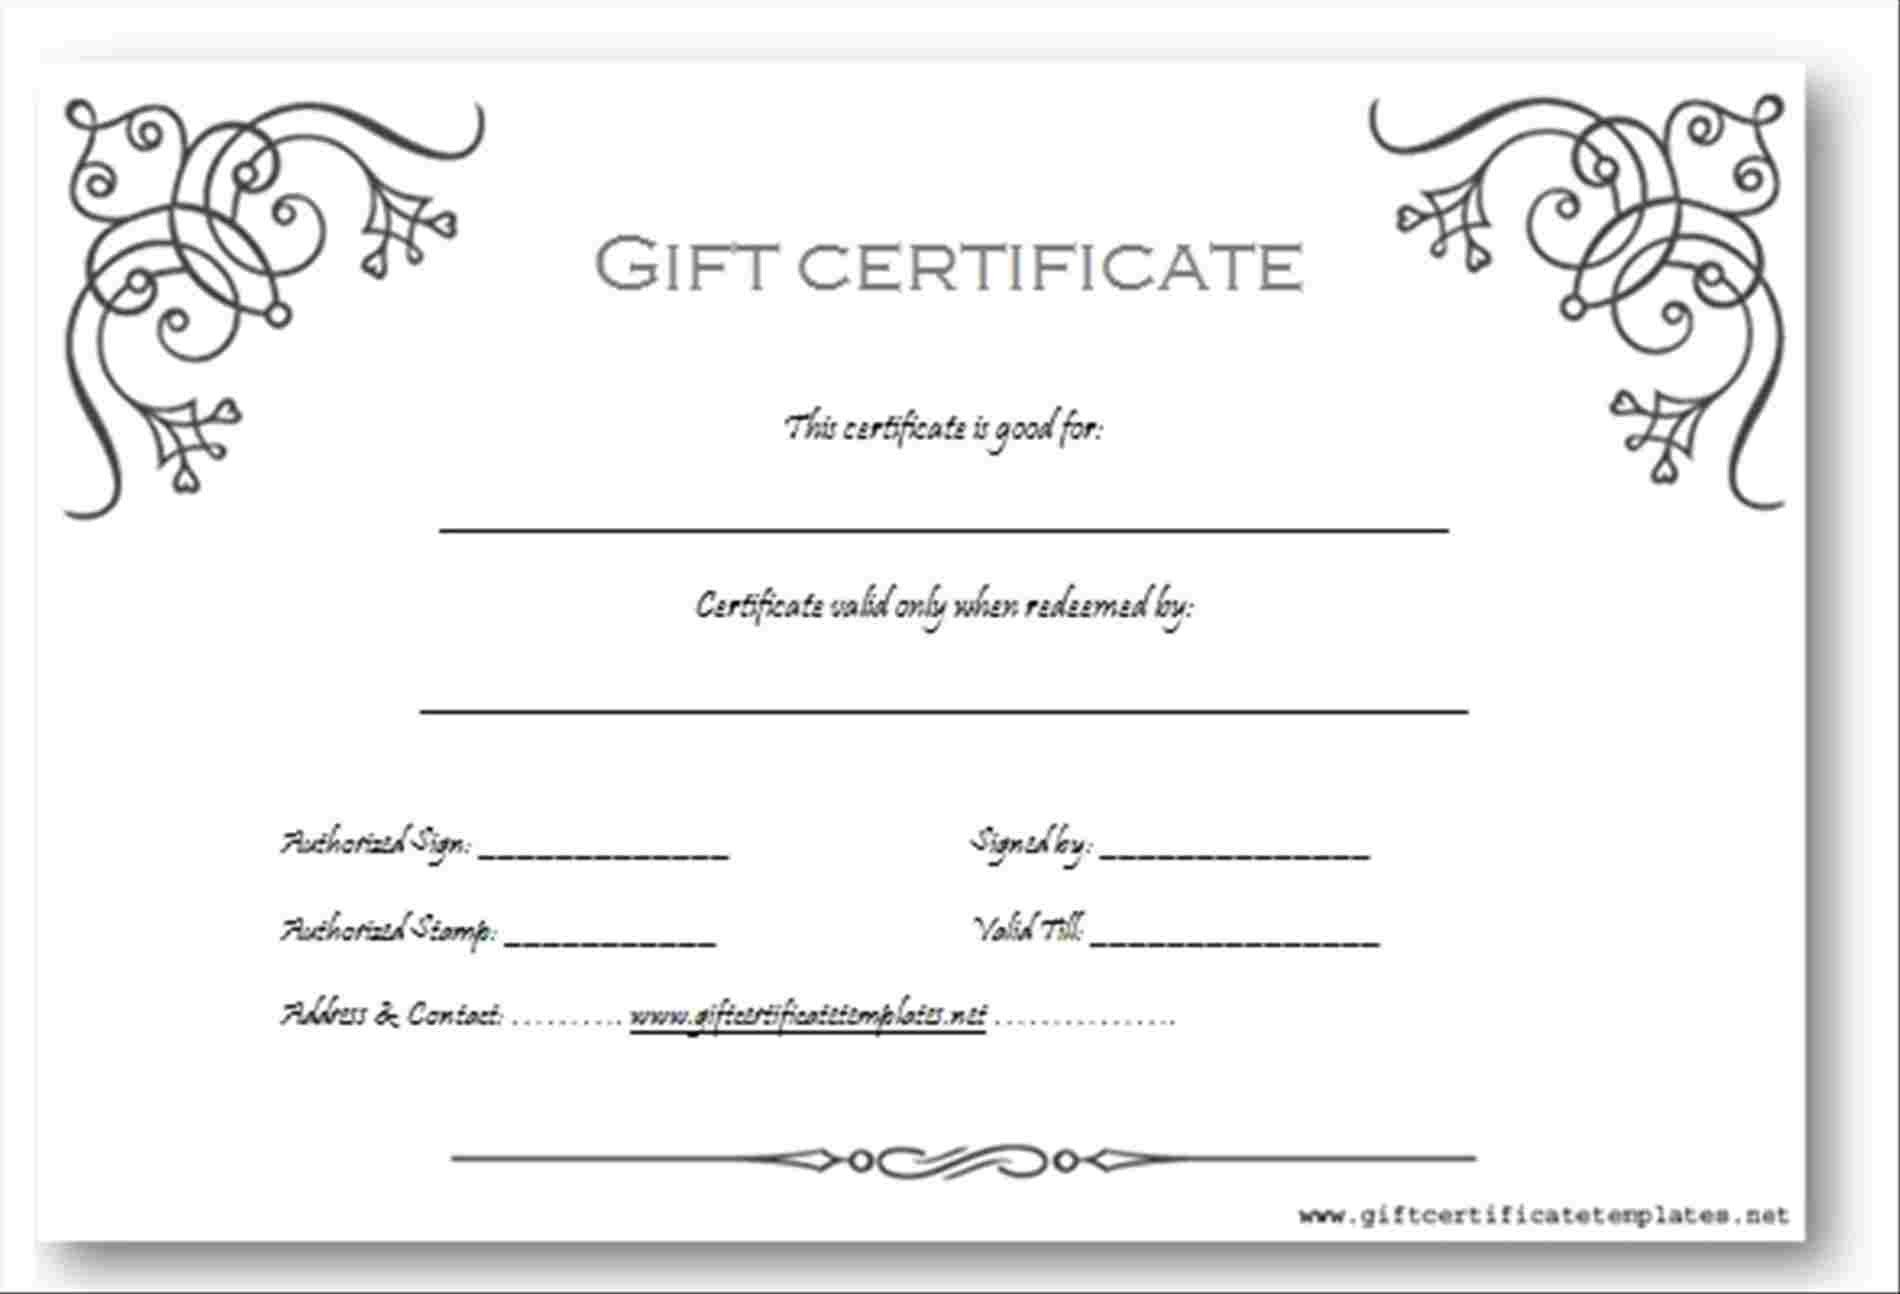 Gift Certificate Template Word Gift Voucher Templates Word Pics – Gift Voucher Template 3